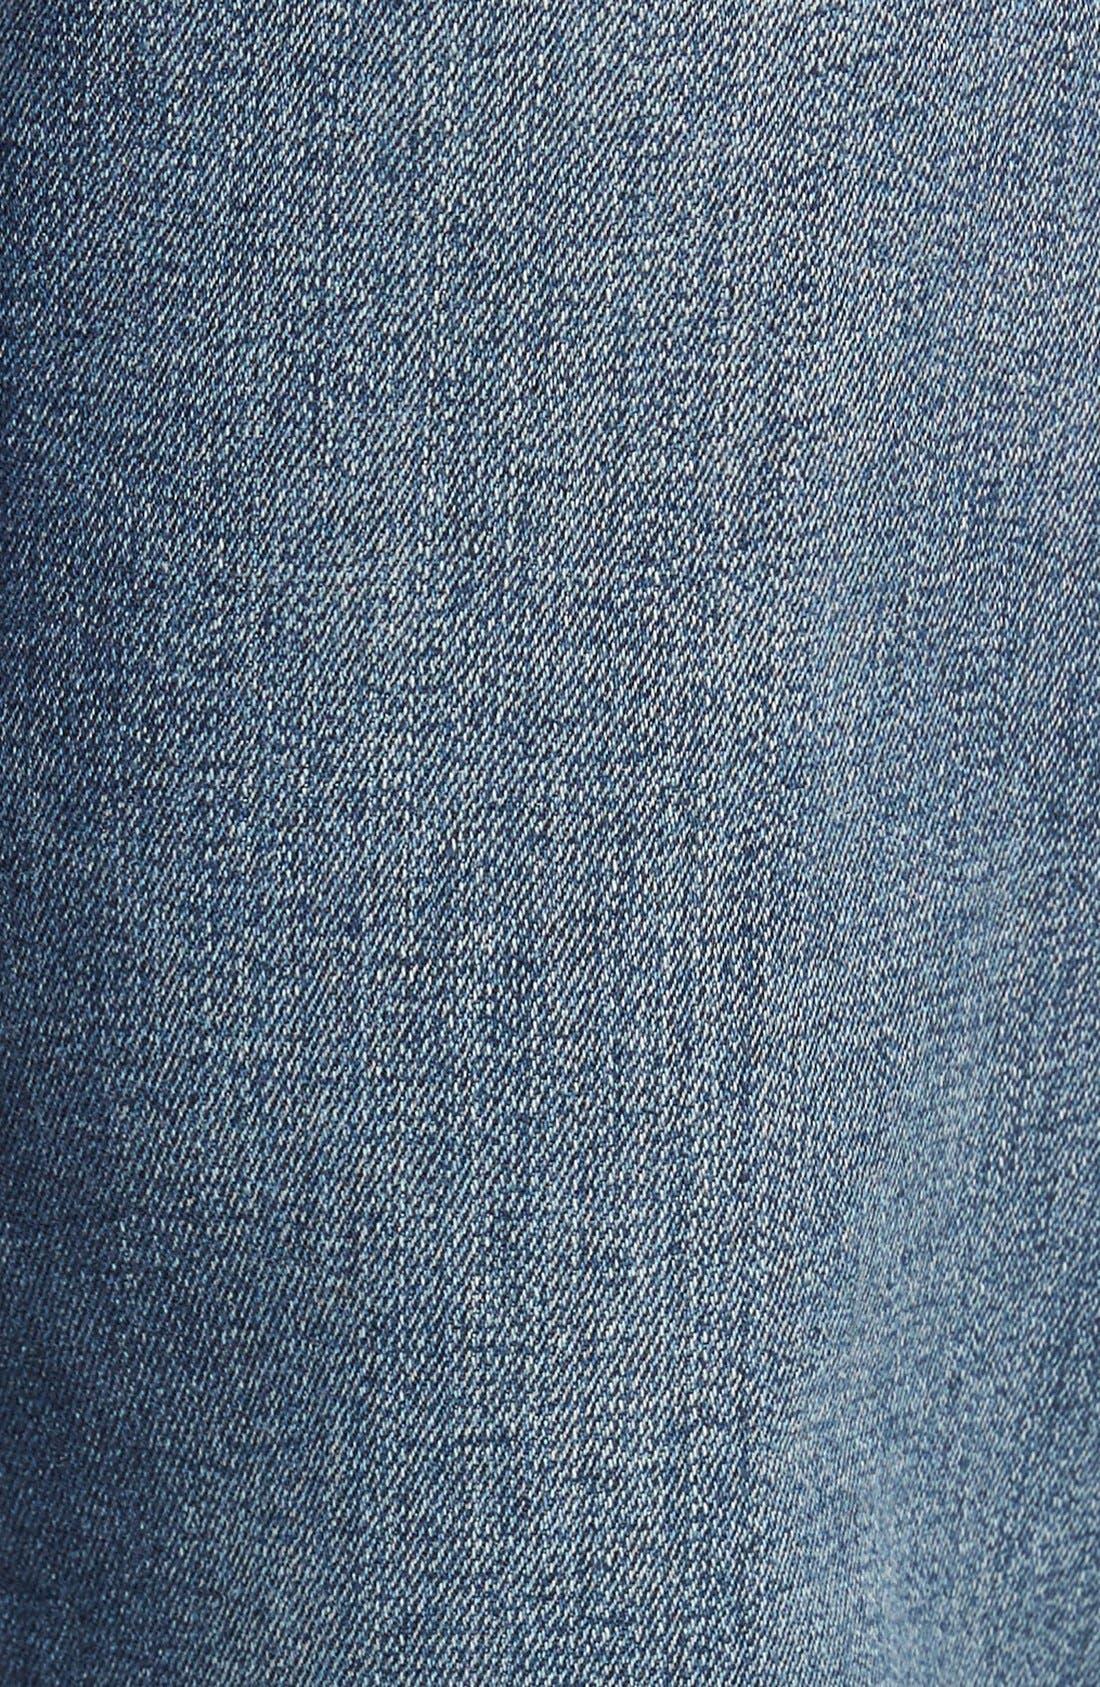 Alternate Image 5  - Mavi Jeans 'Zach' Straight Leg Jeans (Mid Blue)